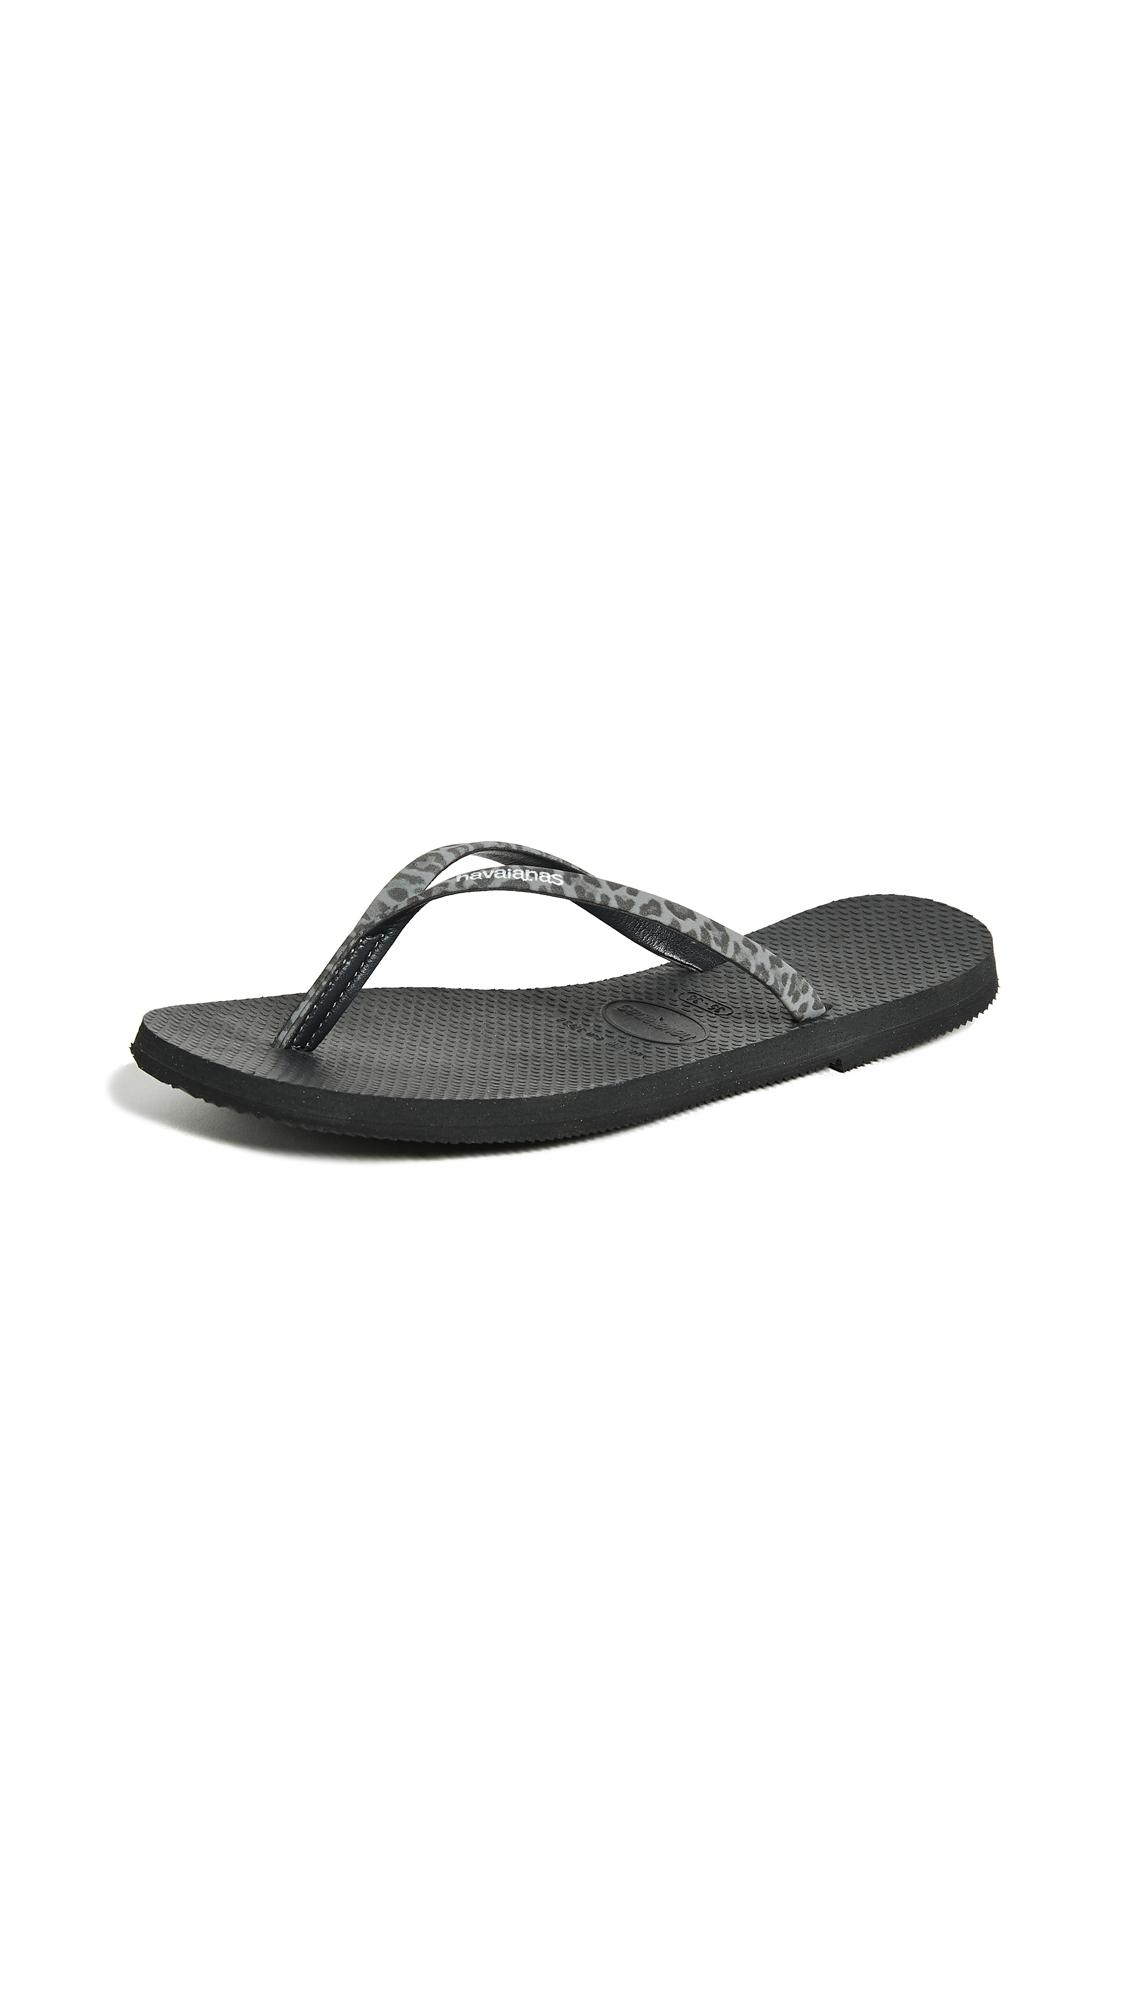 Havaianas You Animals Flip Flops - Black